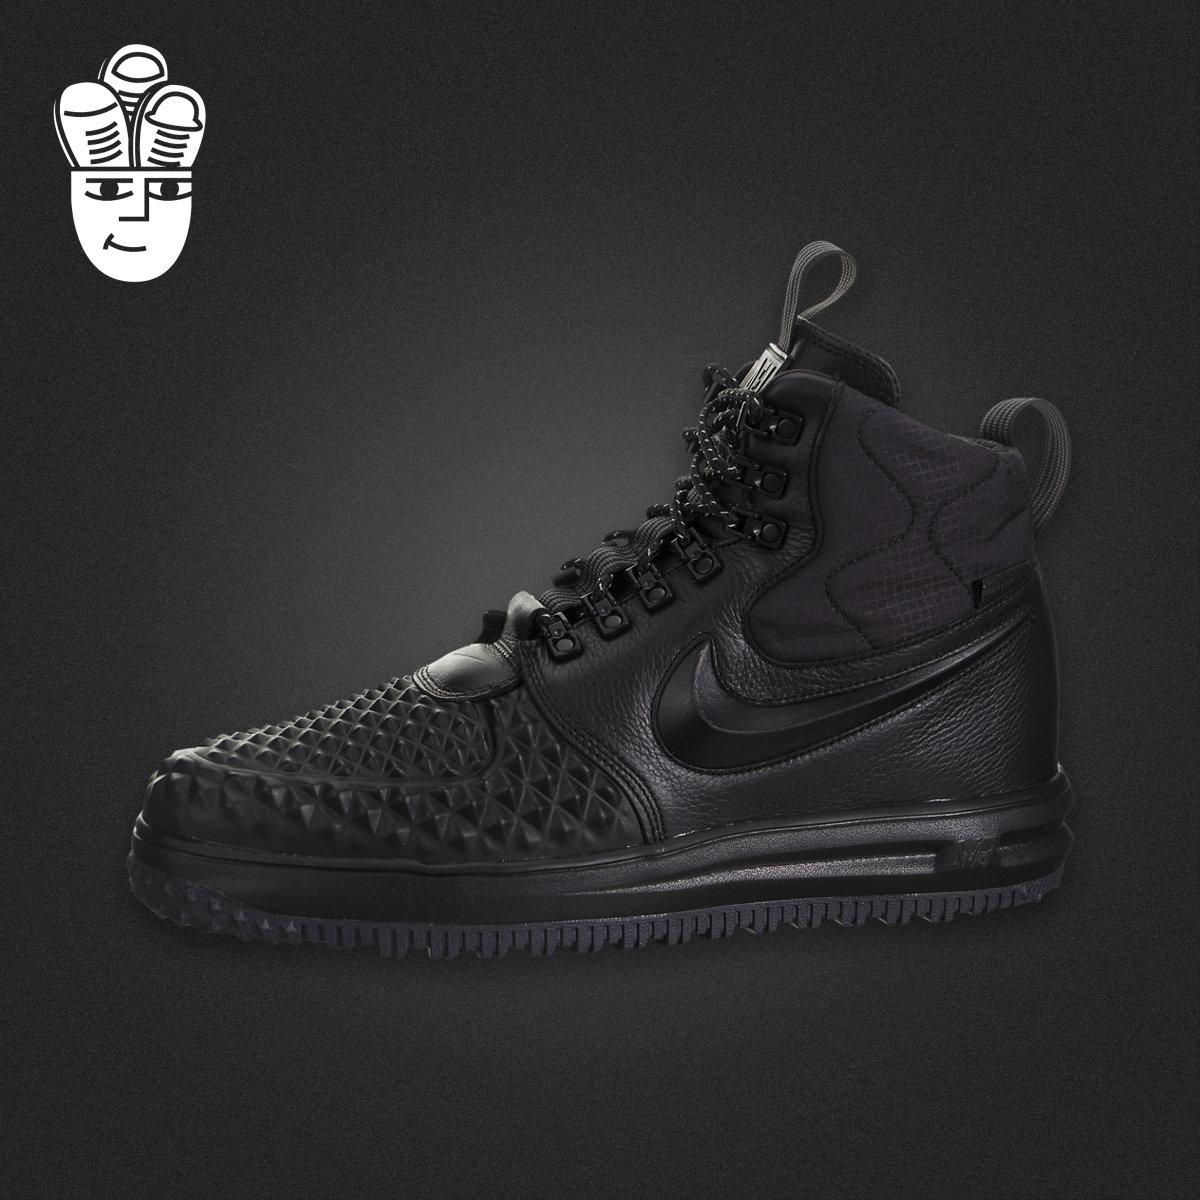 Nike Lunar Force 1 Duckboot '17 耐克男鞋 高帮休闲鞋 运动鞋